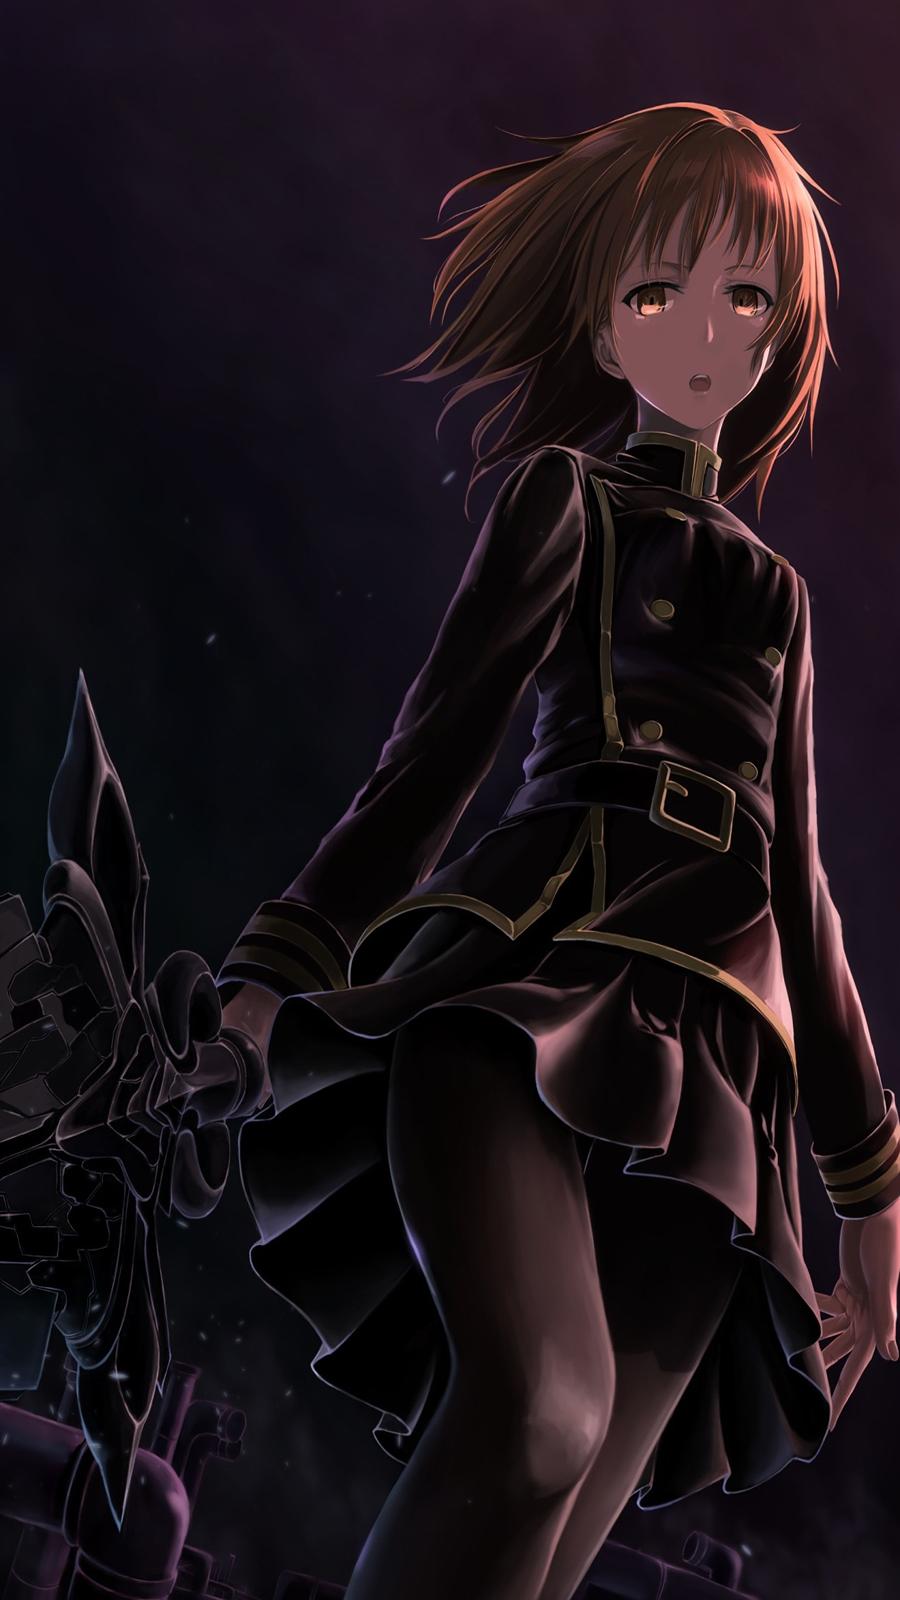 Dark Screen Anime Girl HD Wallpapers Download